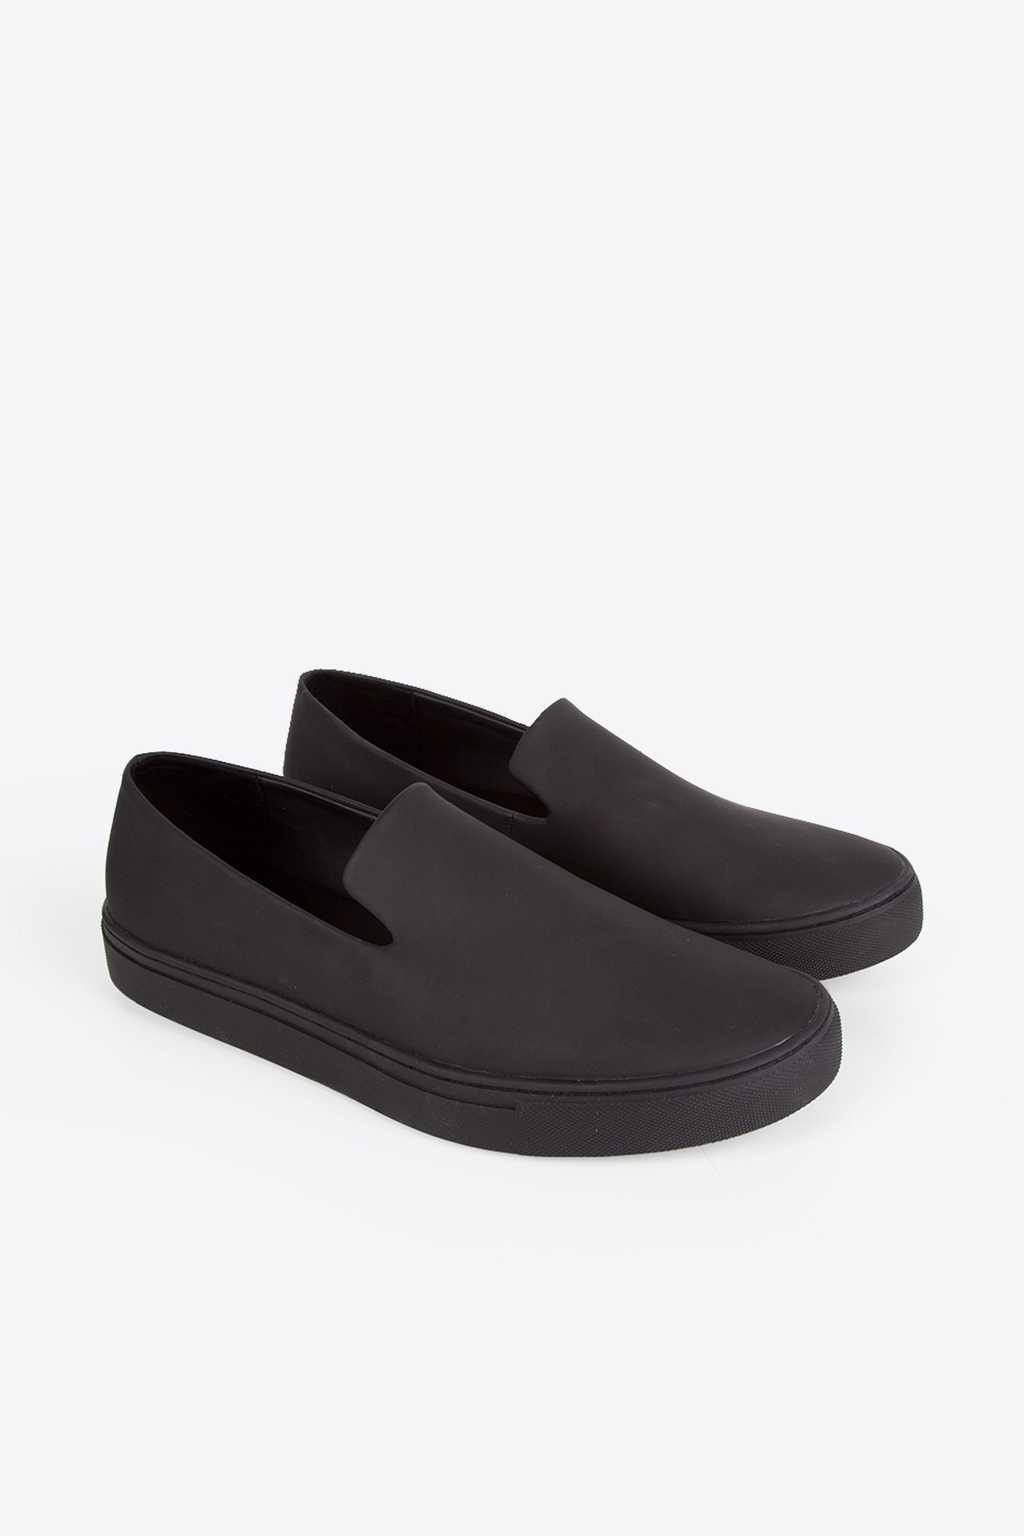 Slip On 1259 Black 8